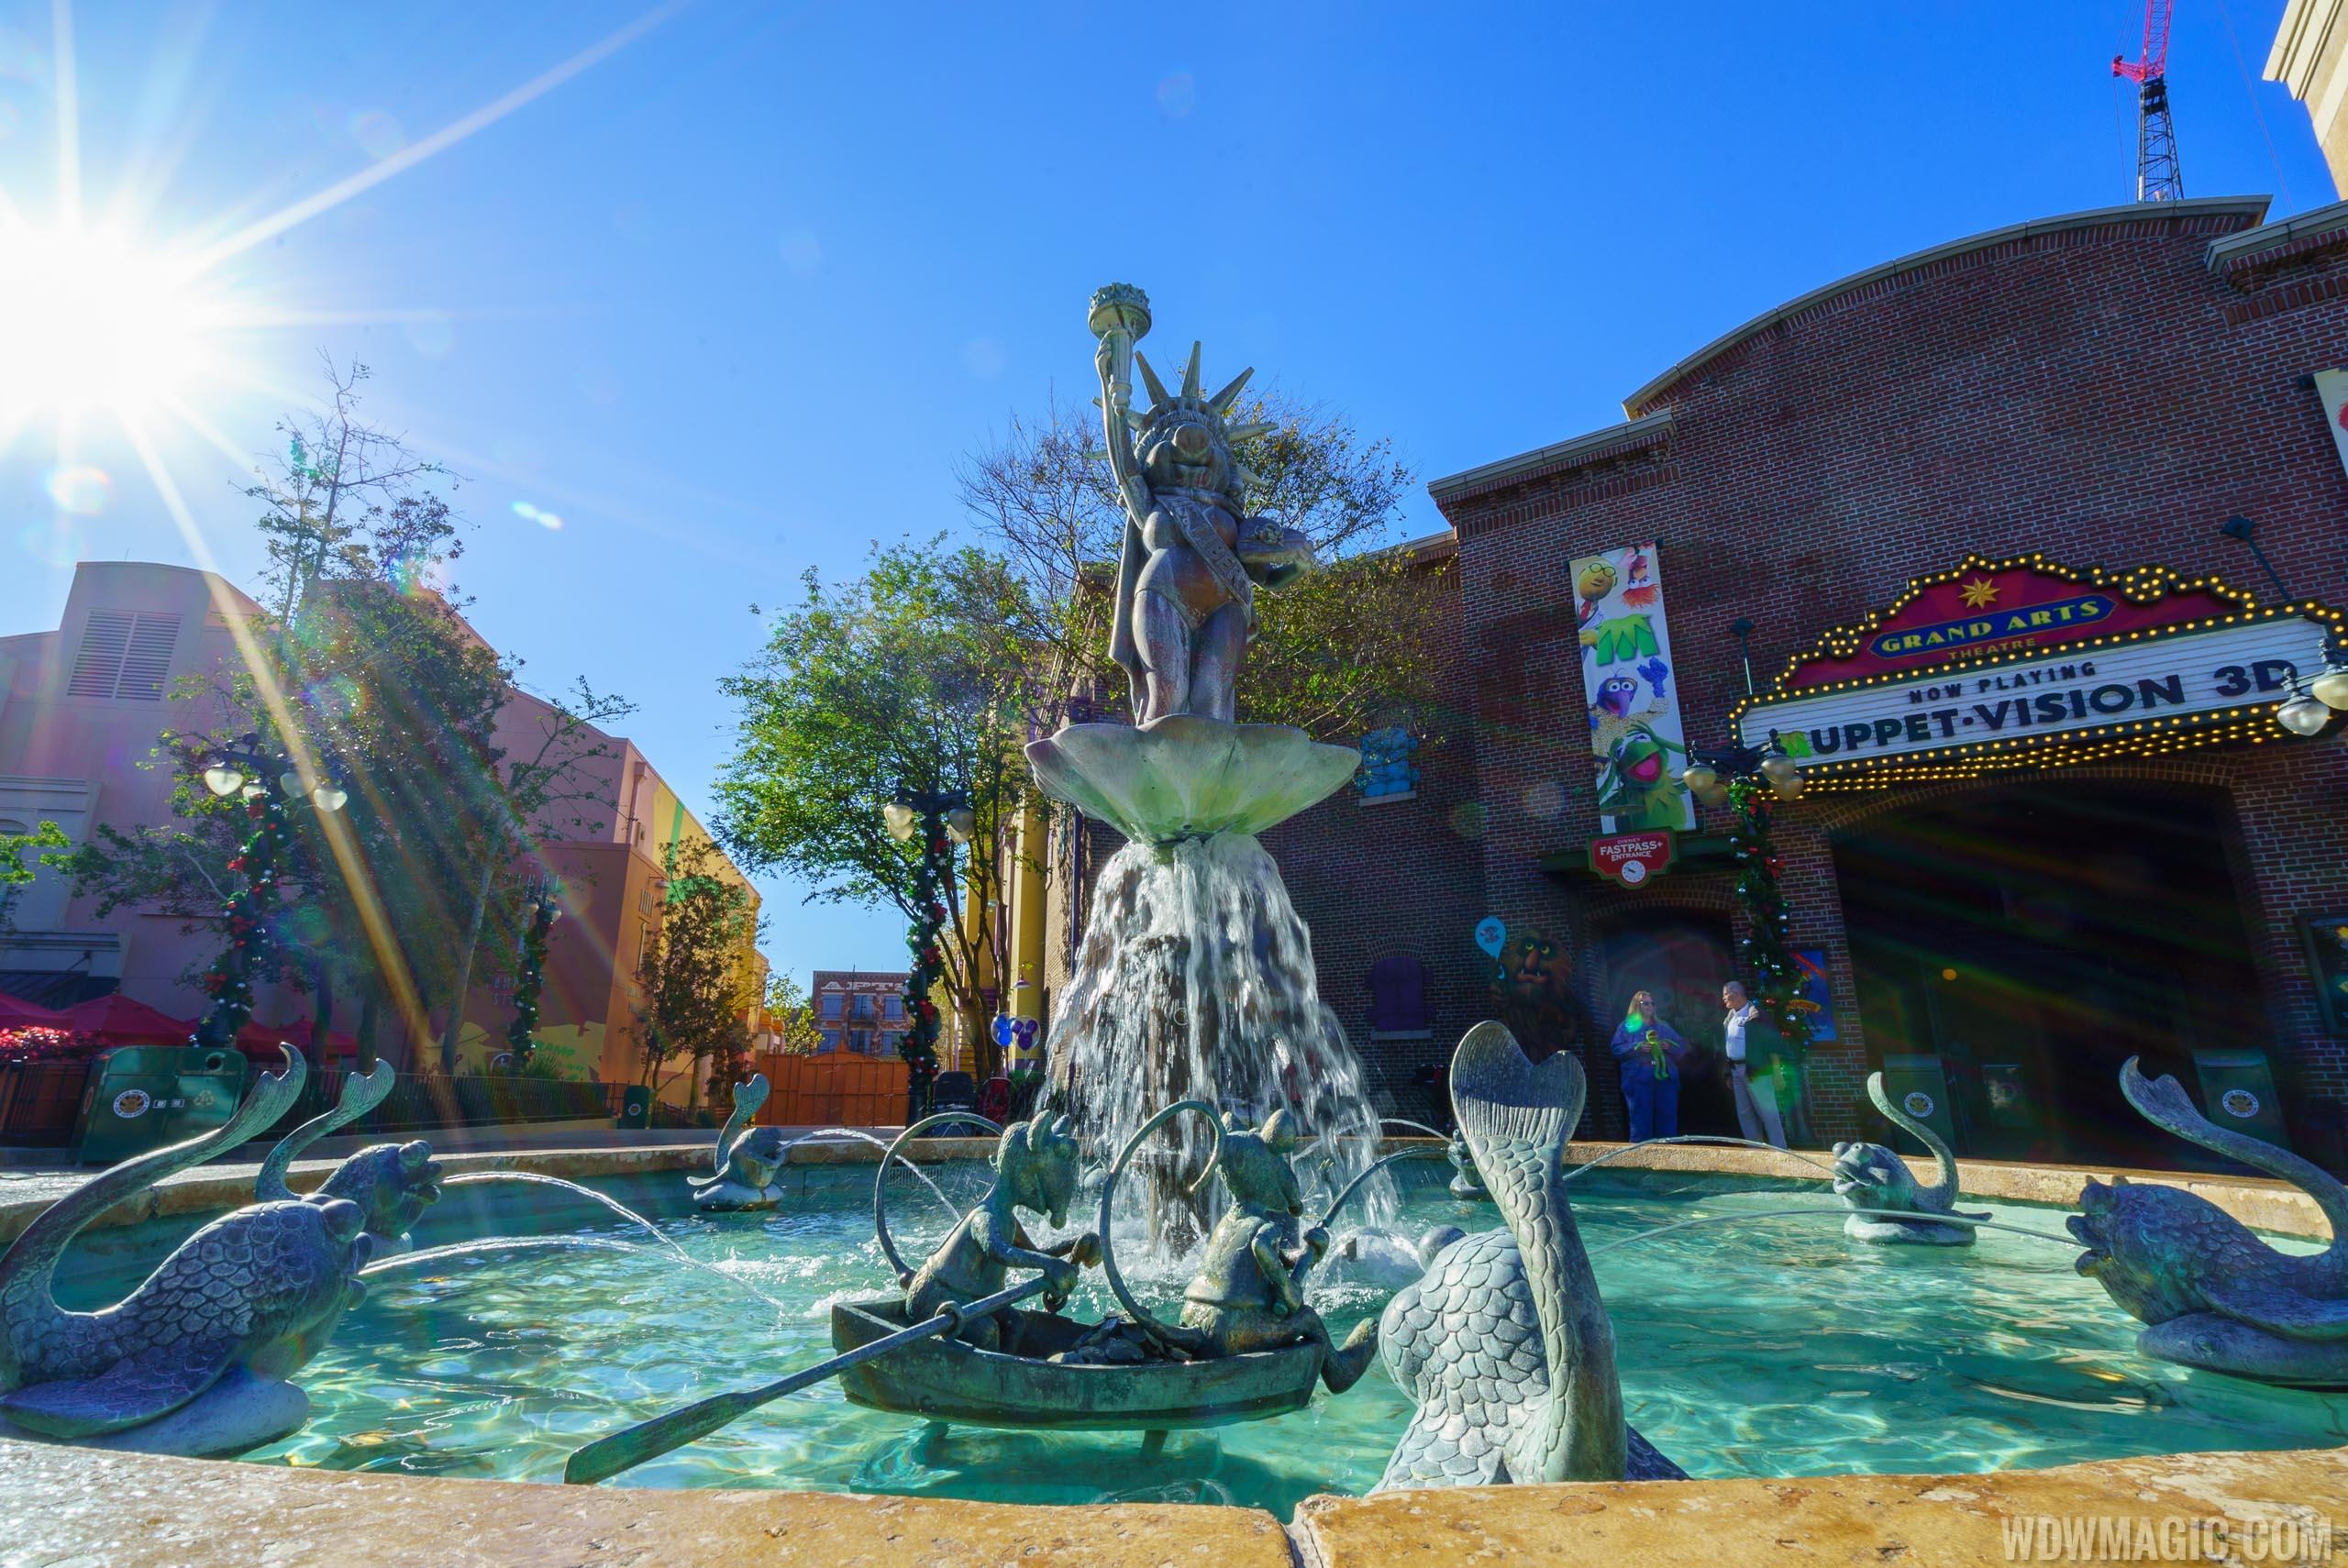 Muppets fountain restored in Grand Avenue